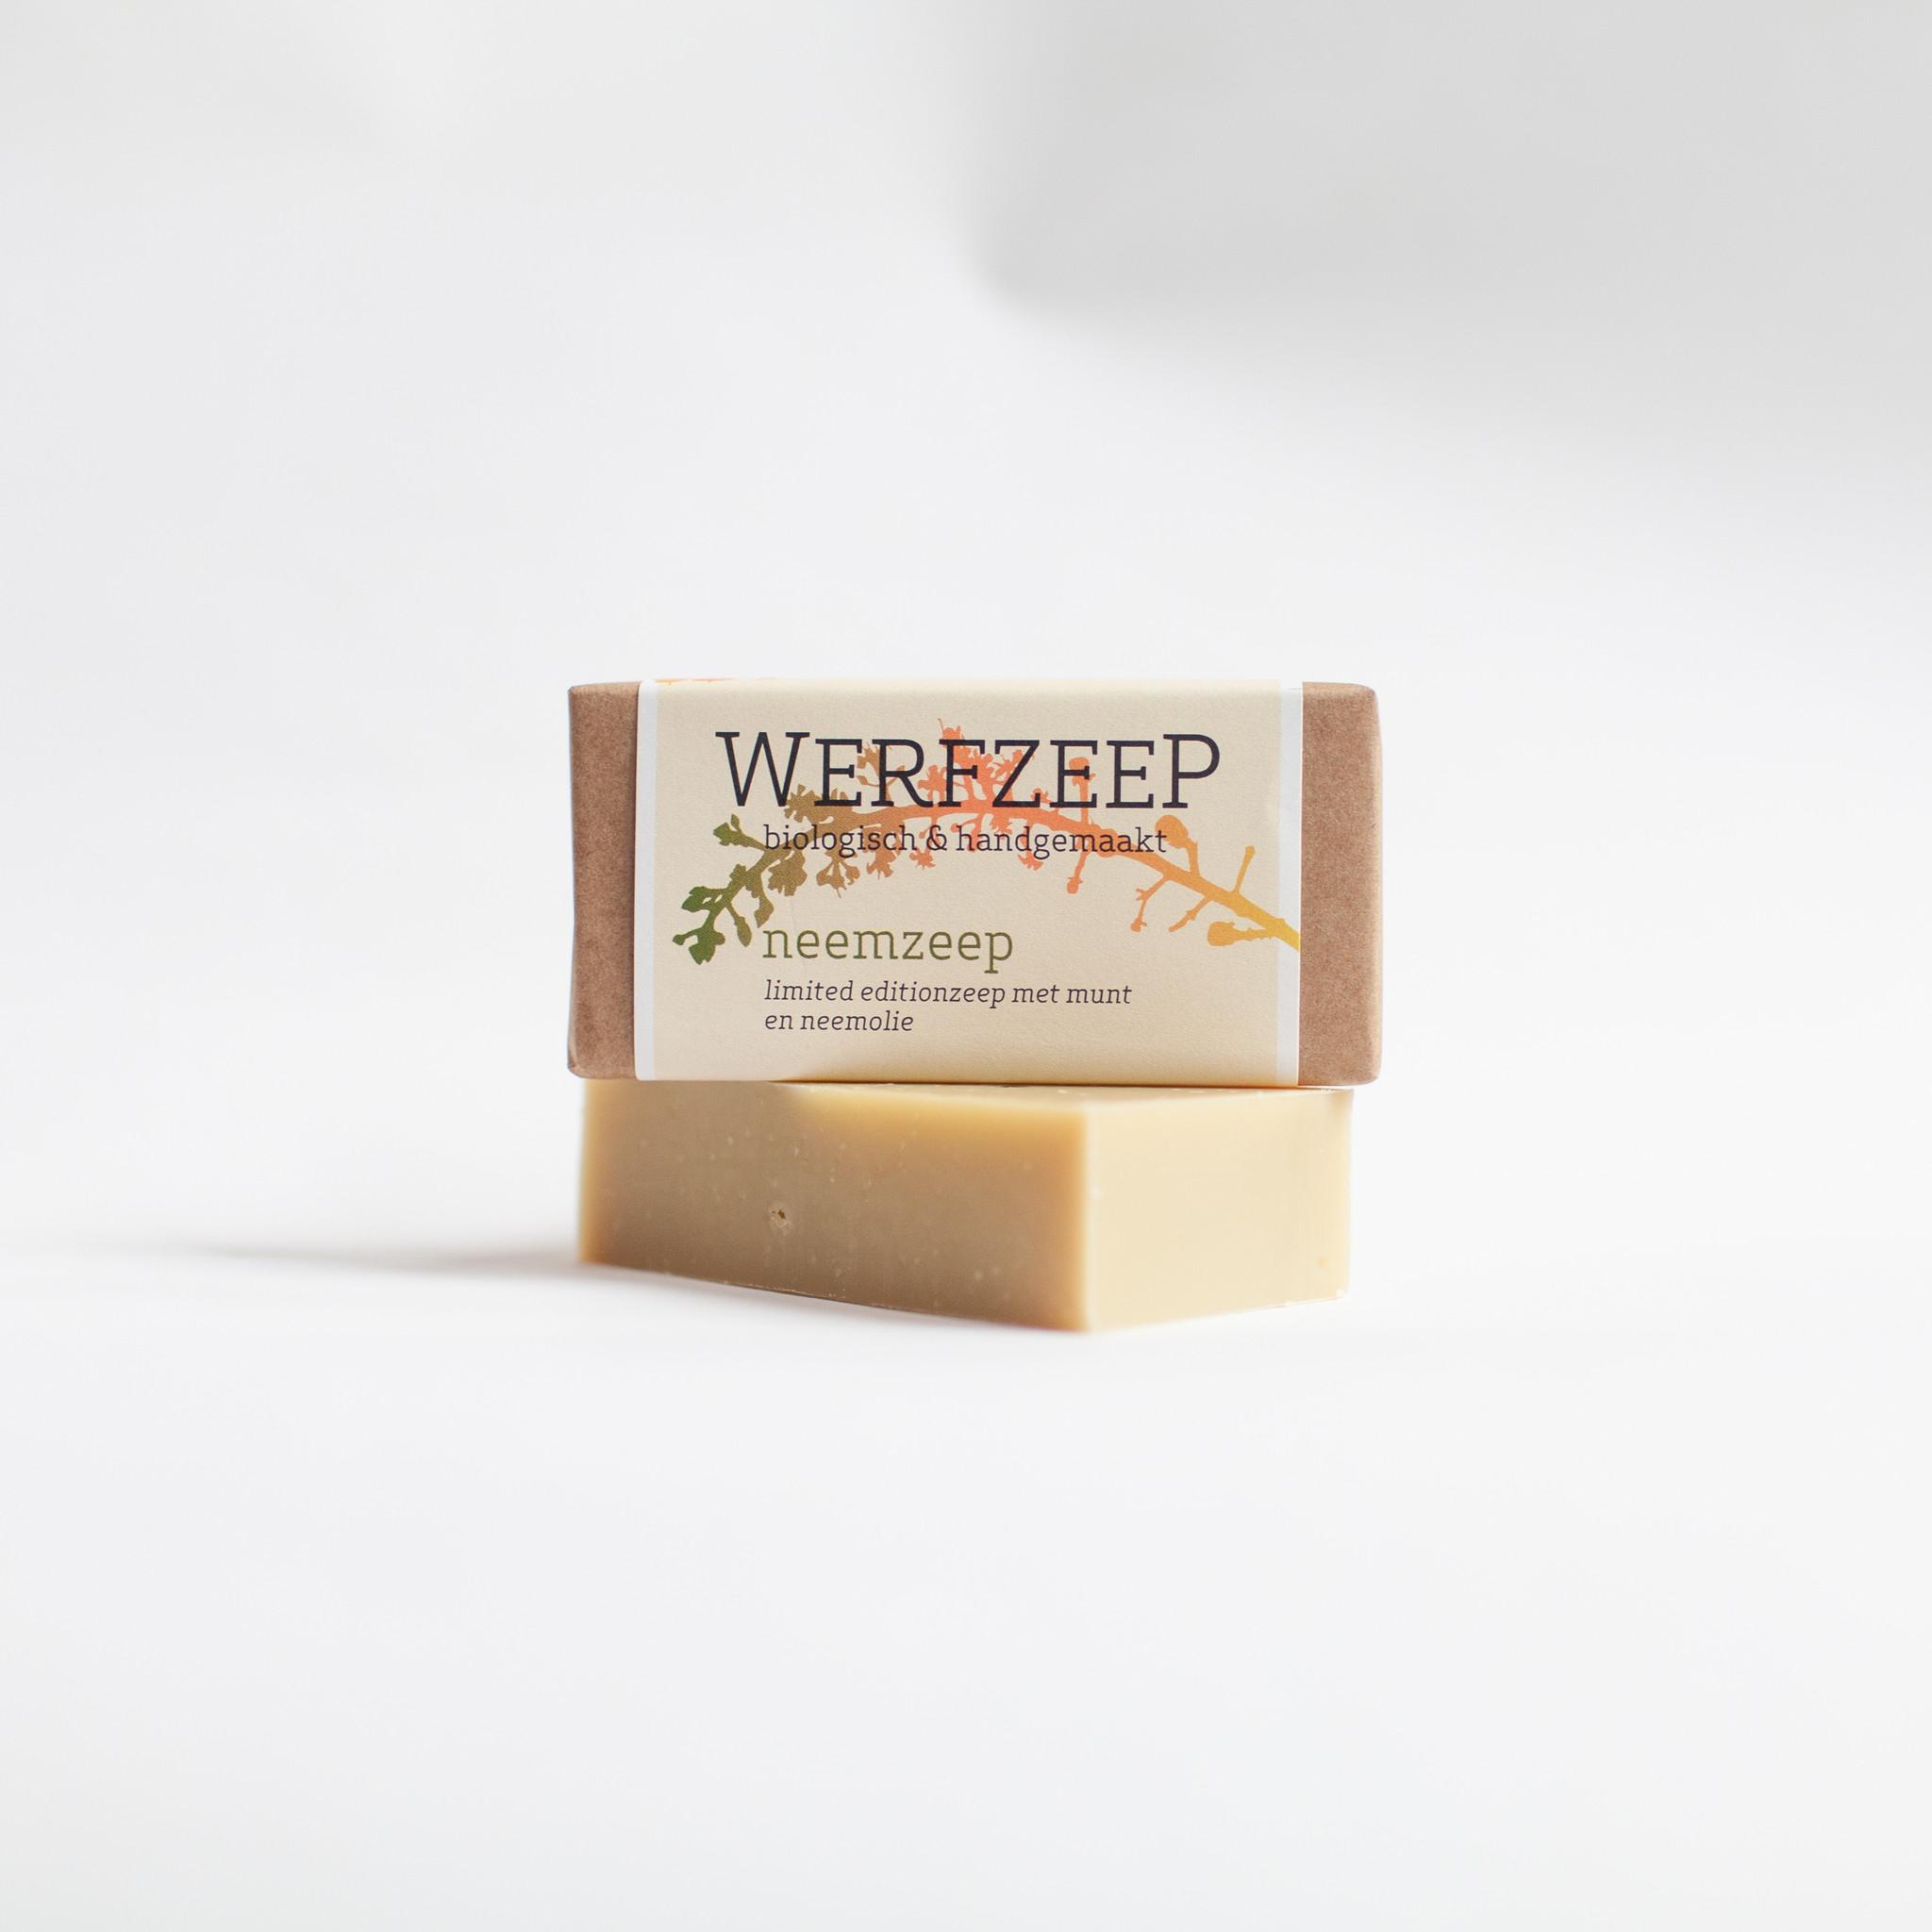 Neemzeep limited edition